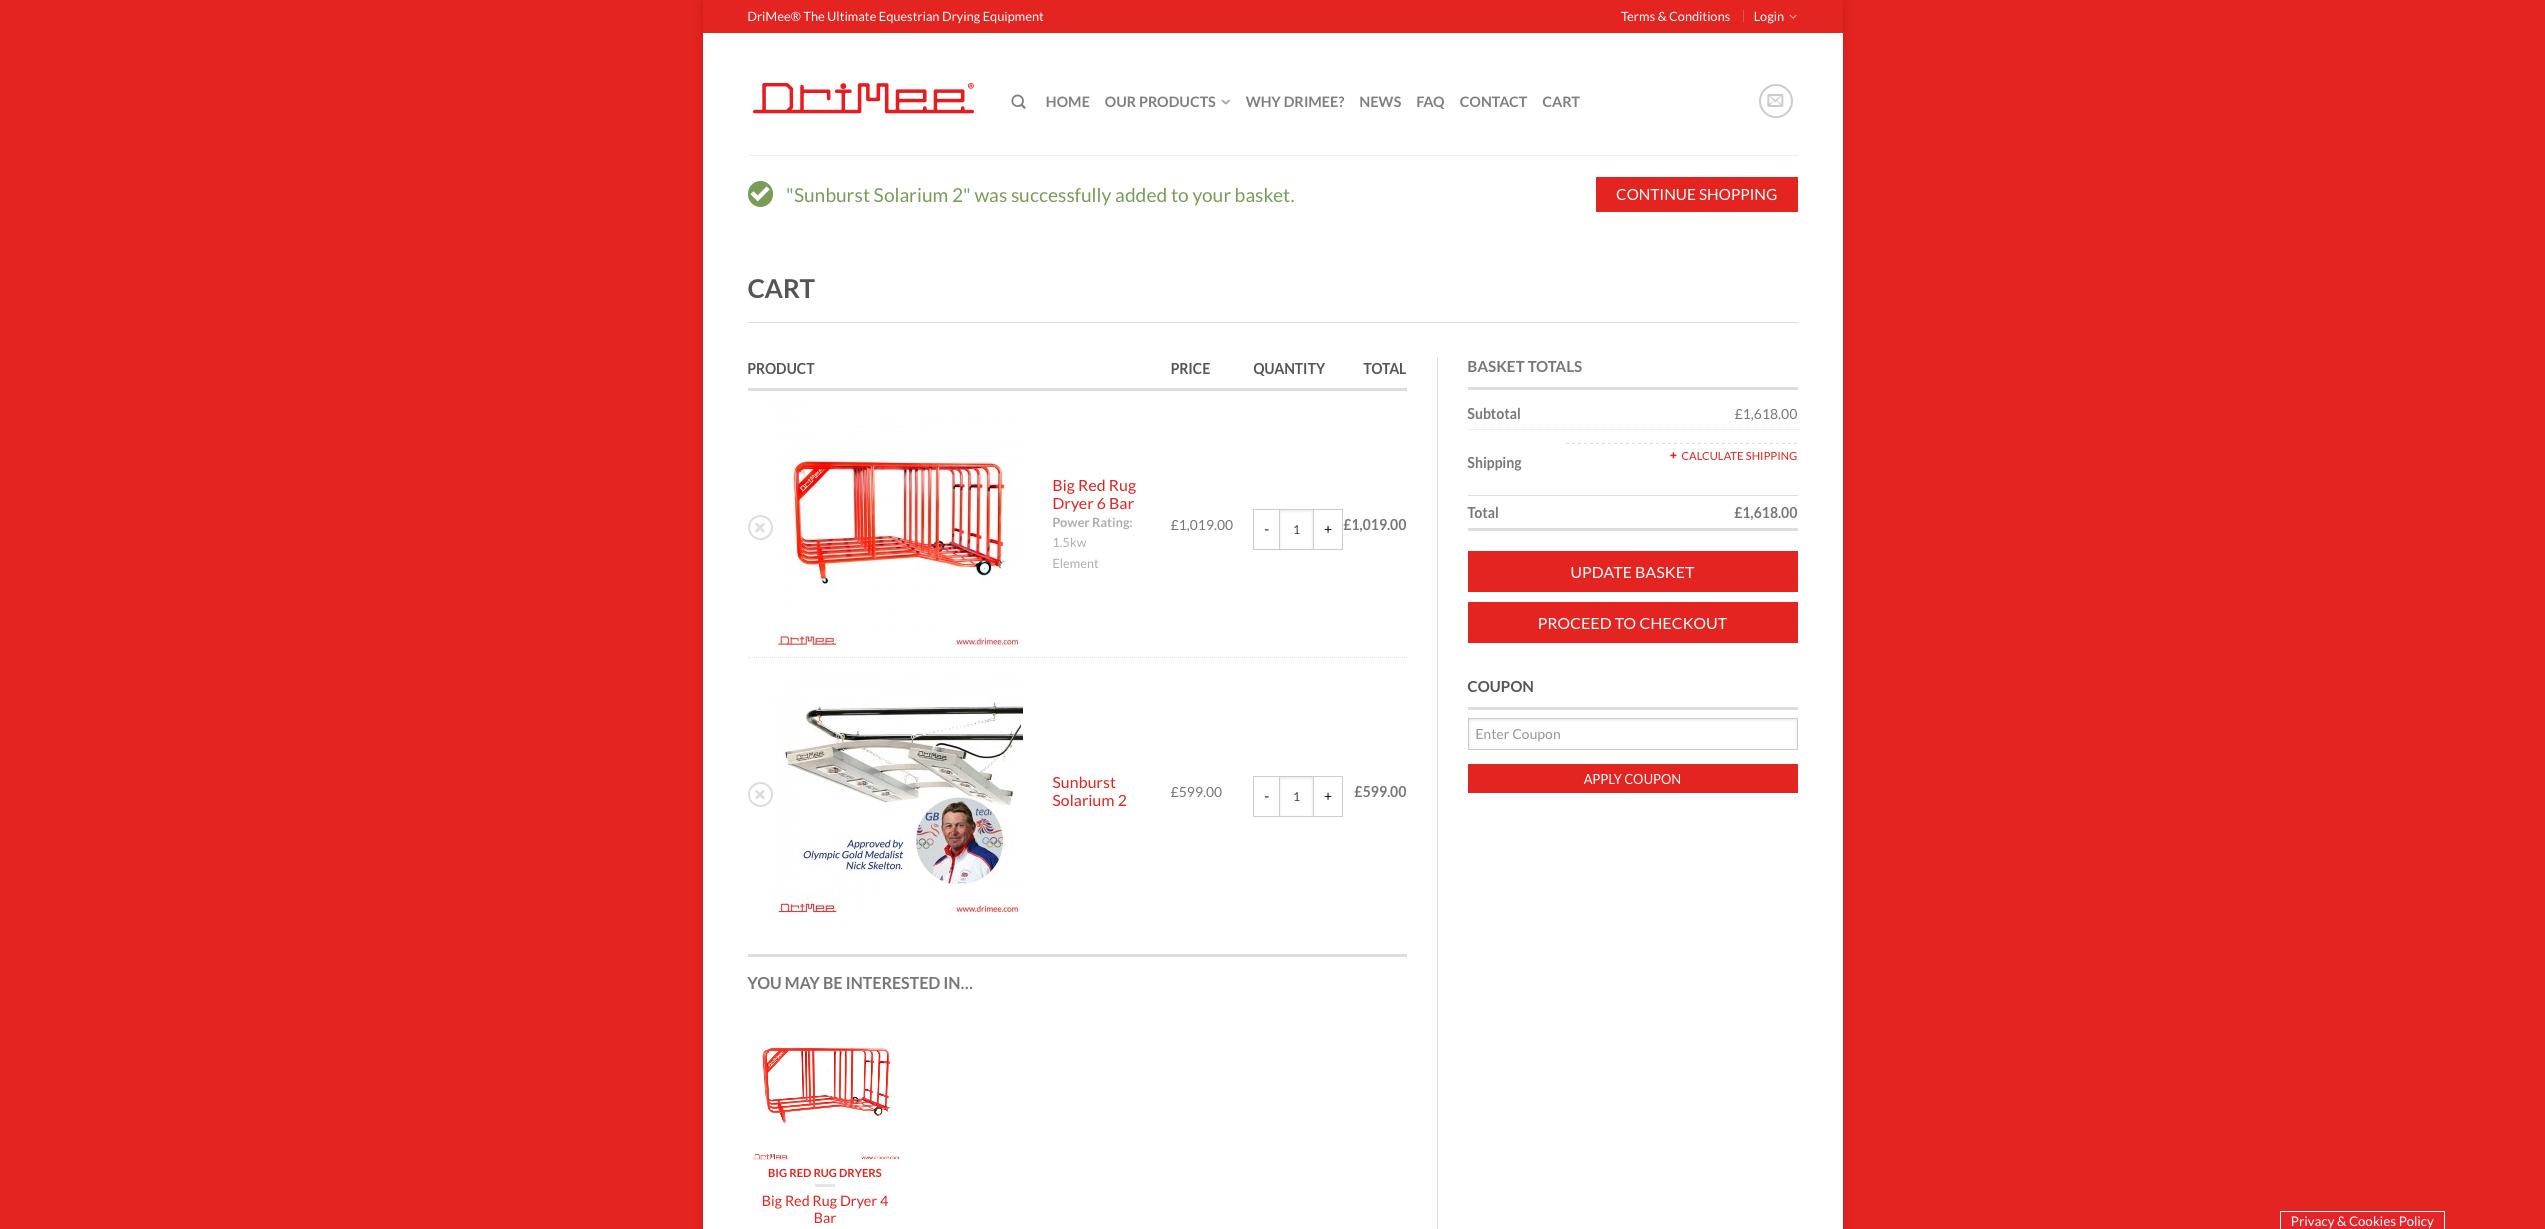 IDEA UK Design and Marketing Drimee Equestrian Horse Equipment Website Design 20